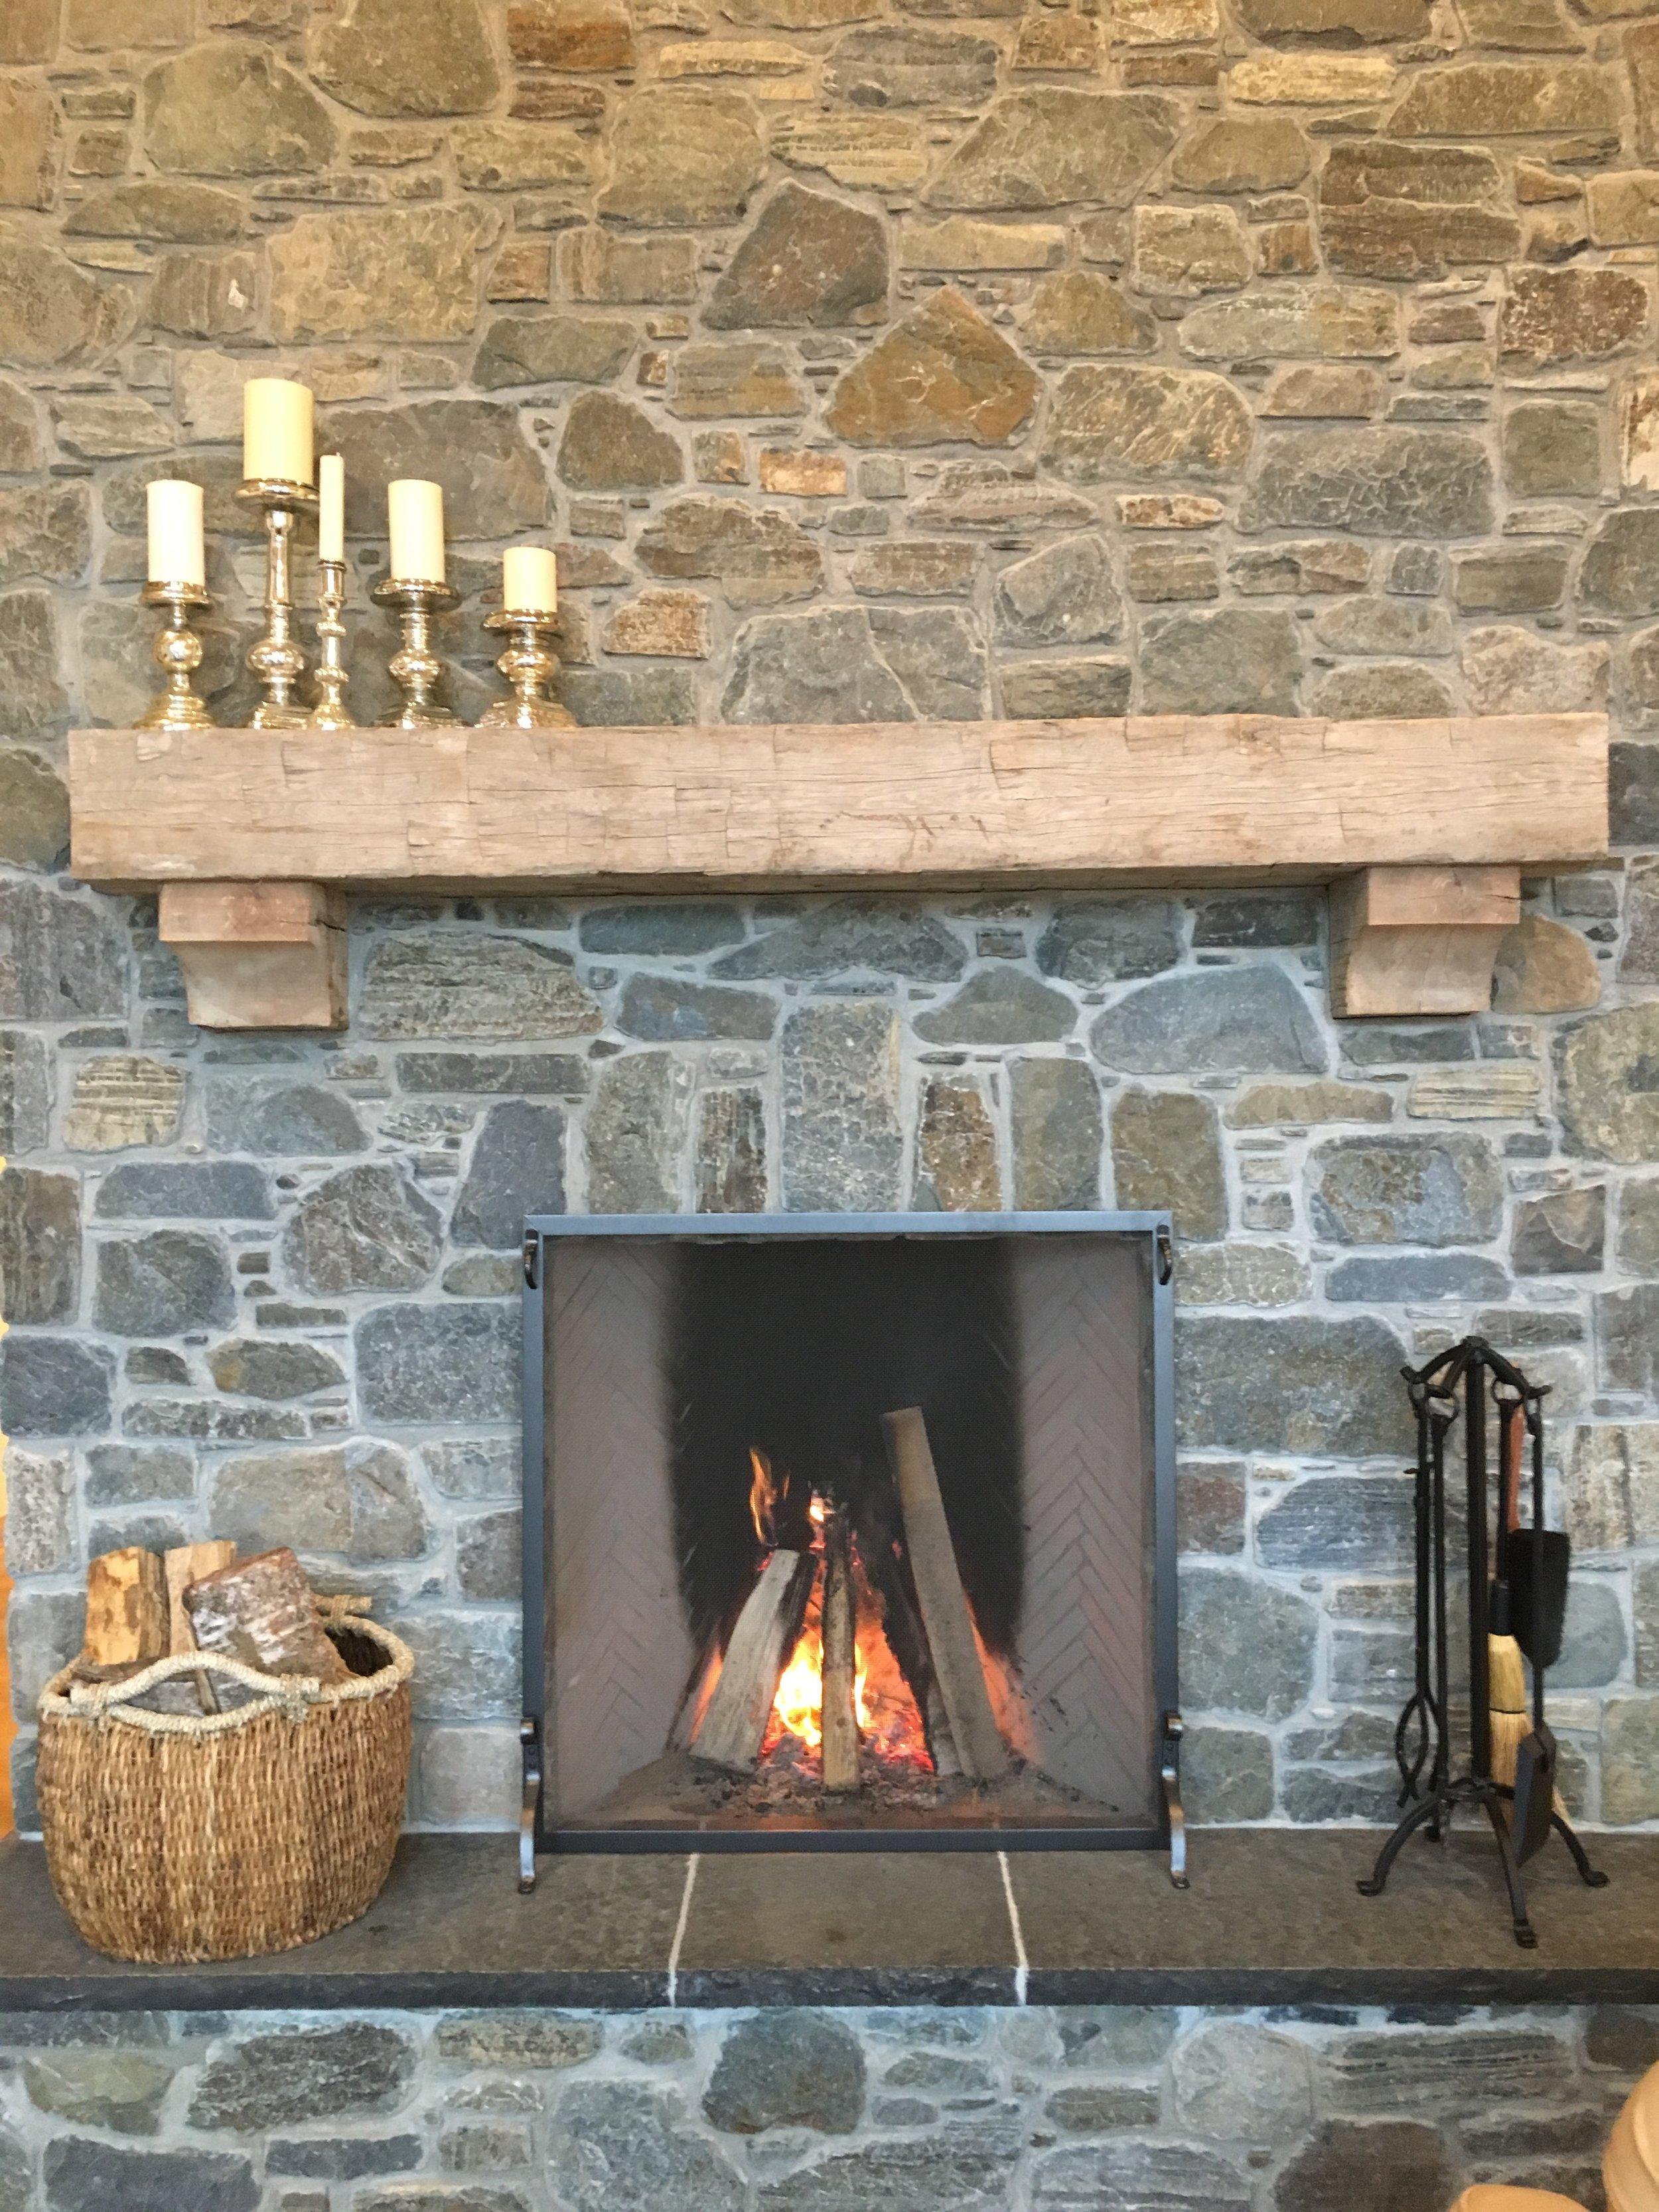 Fireplace at The Alaska Farmhouse